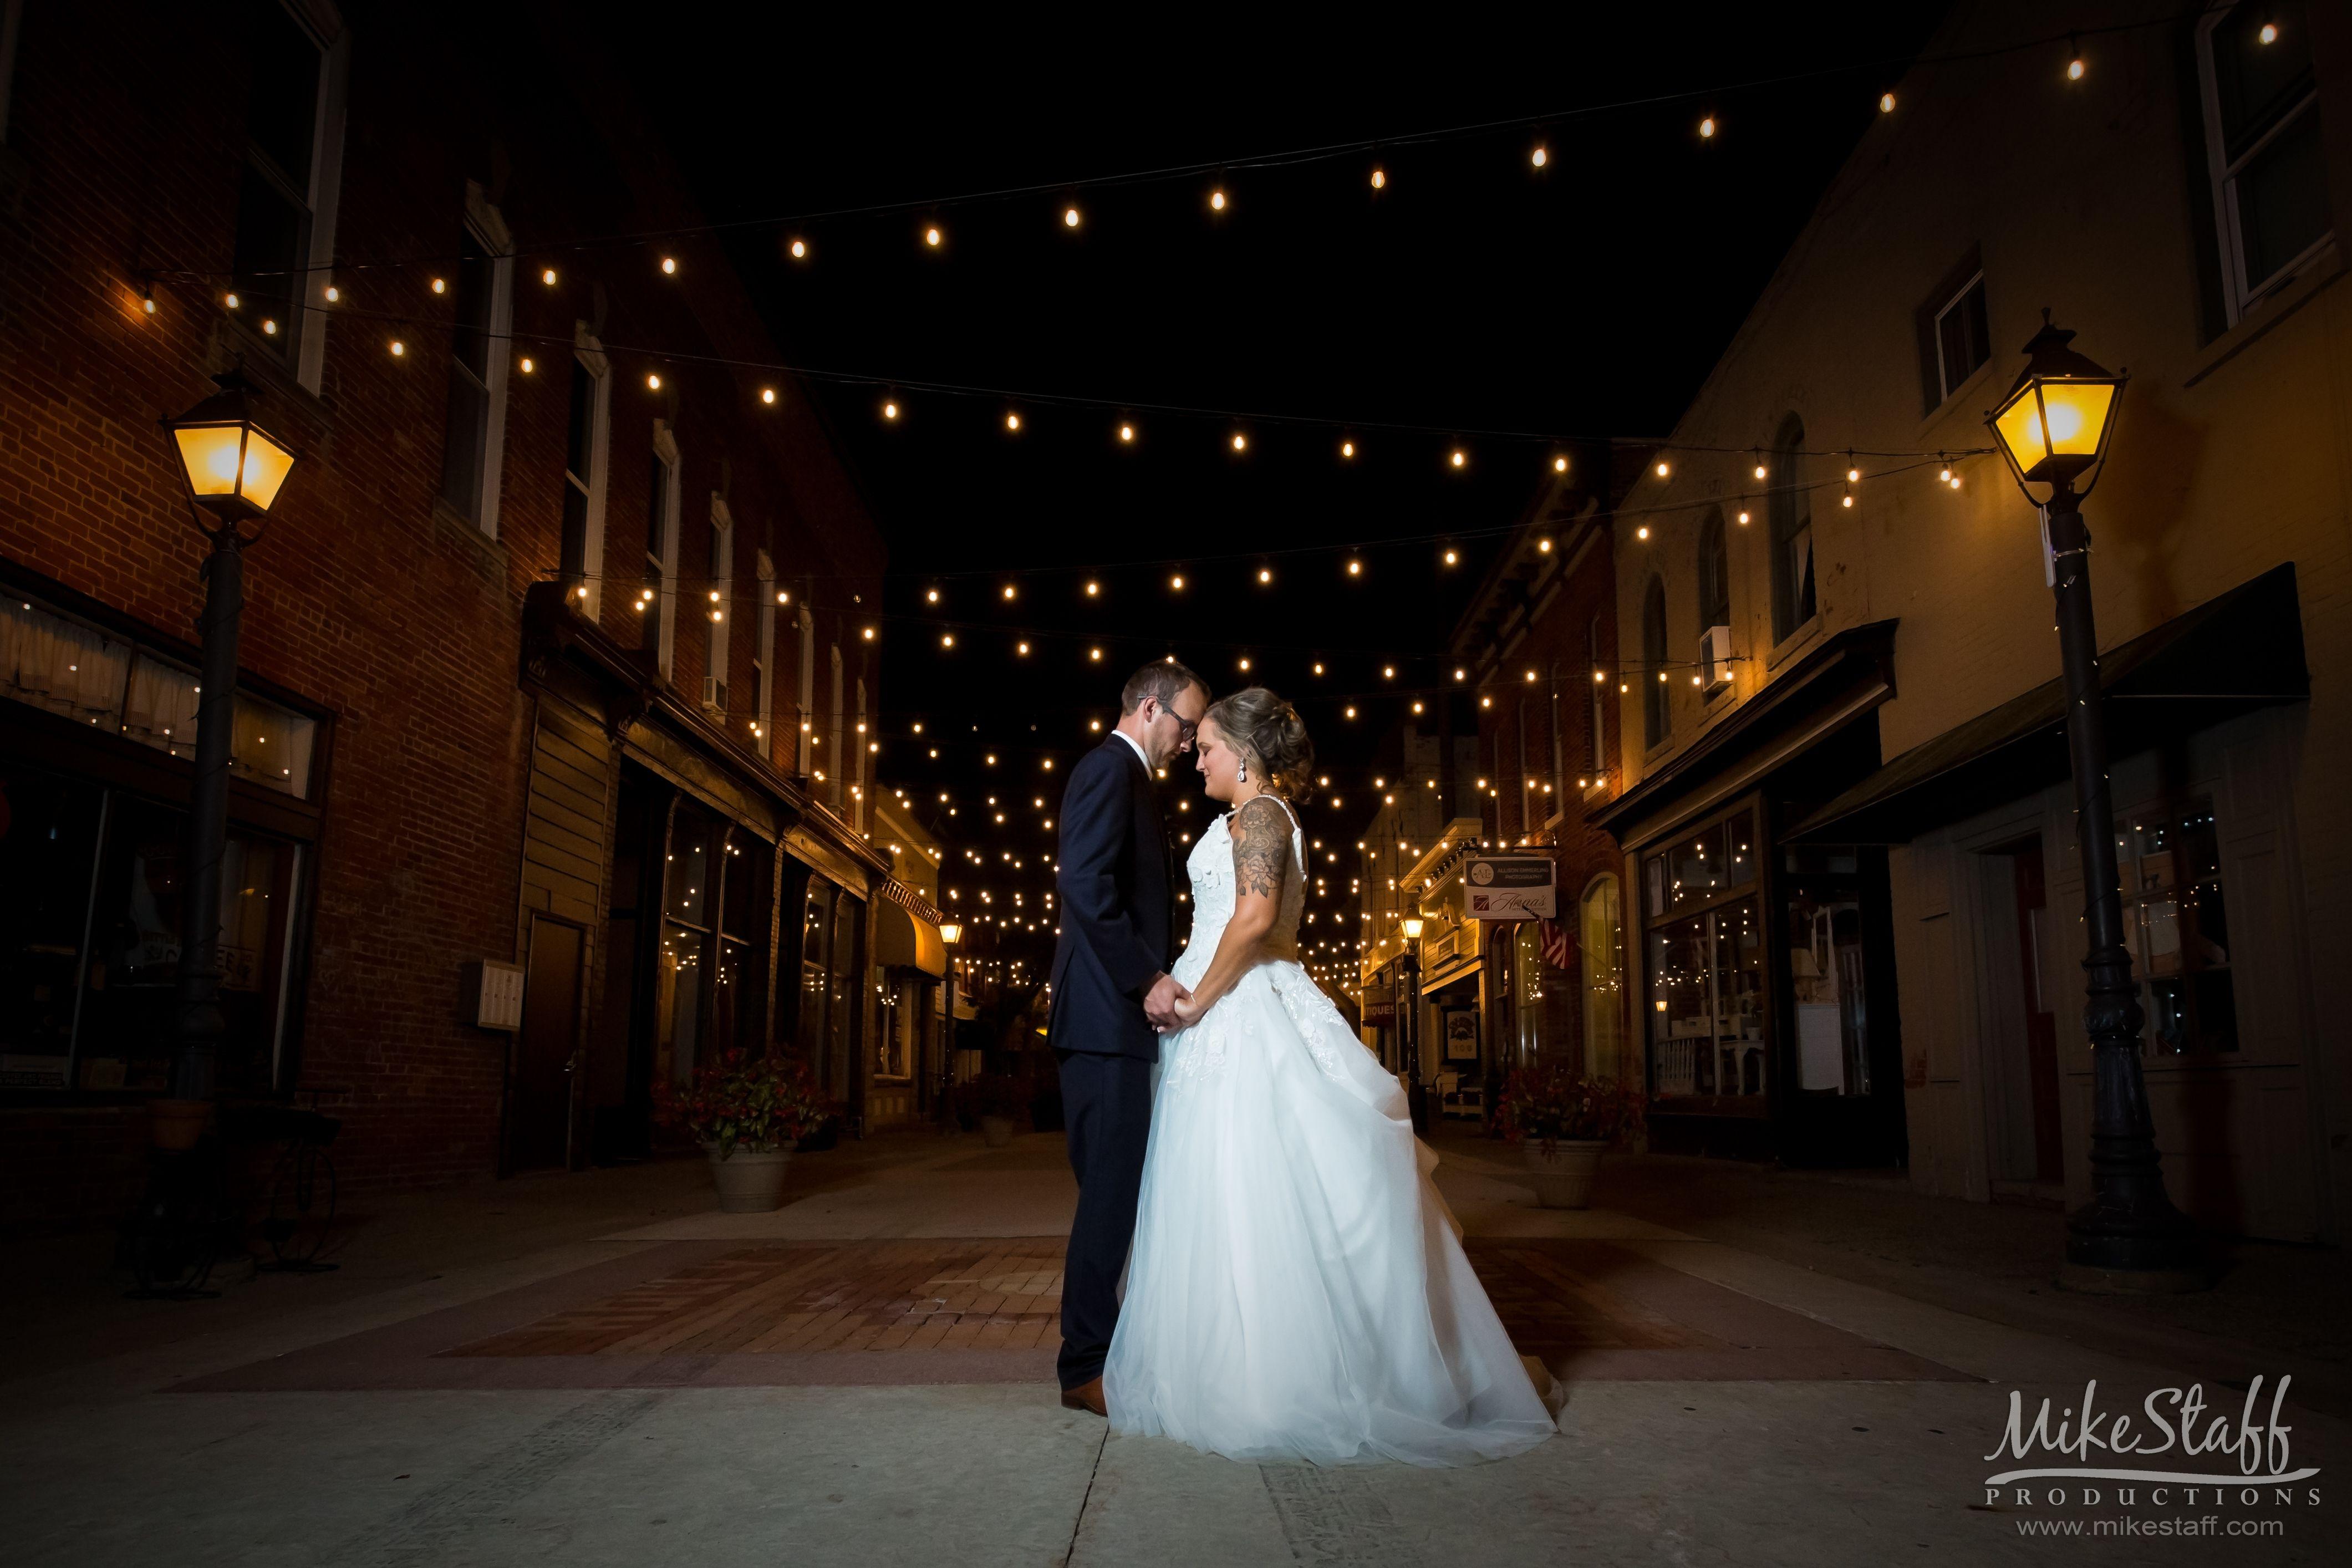 Wedding Photographers in Metro Detroit Detroit wedding